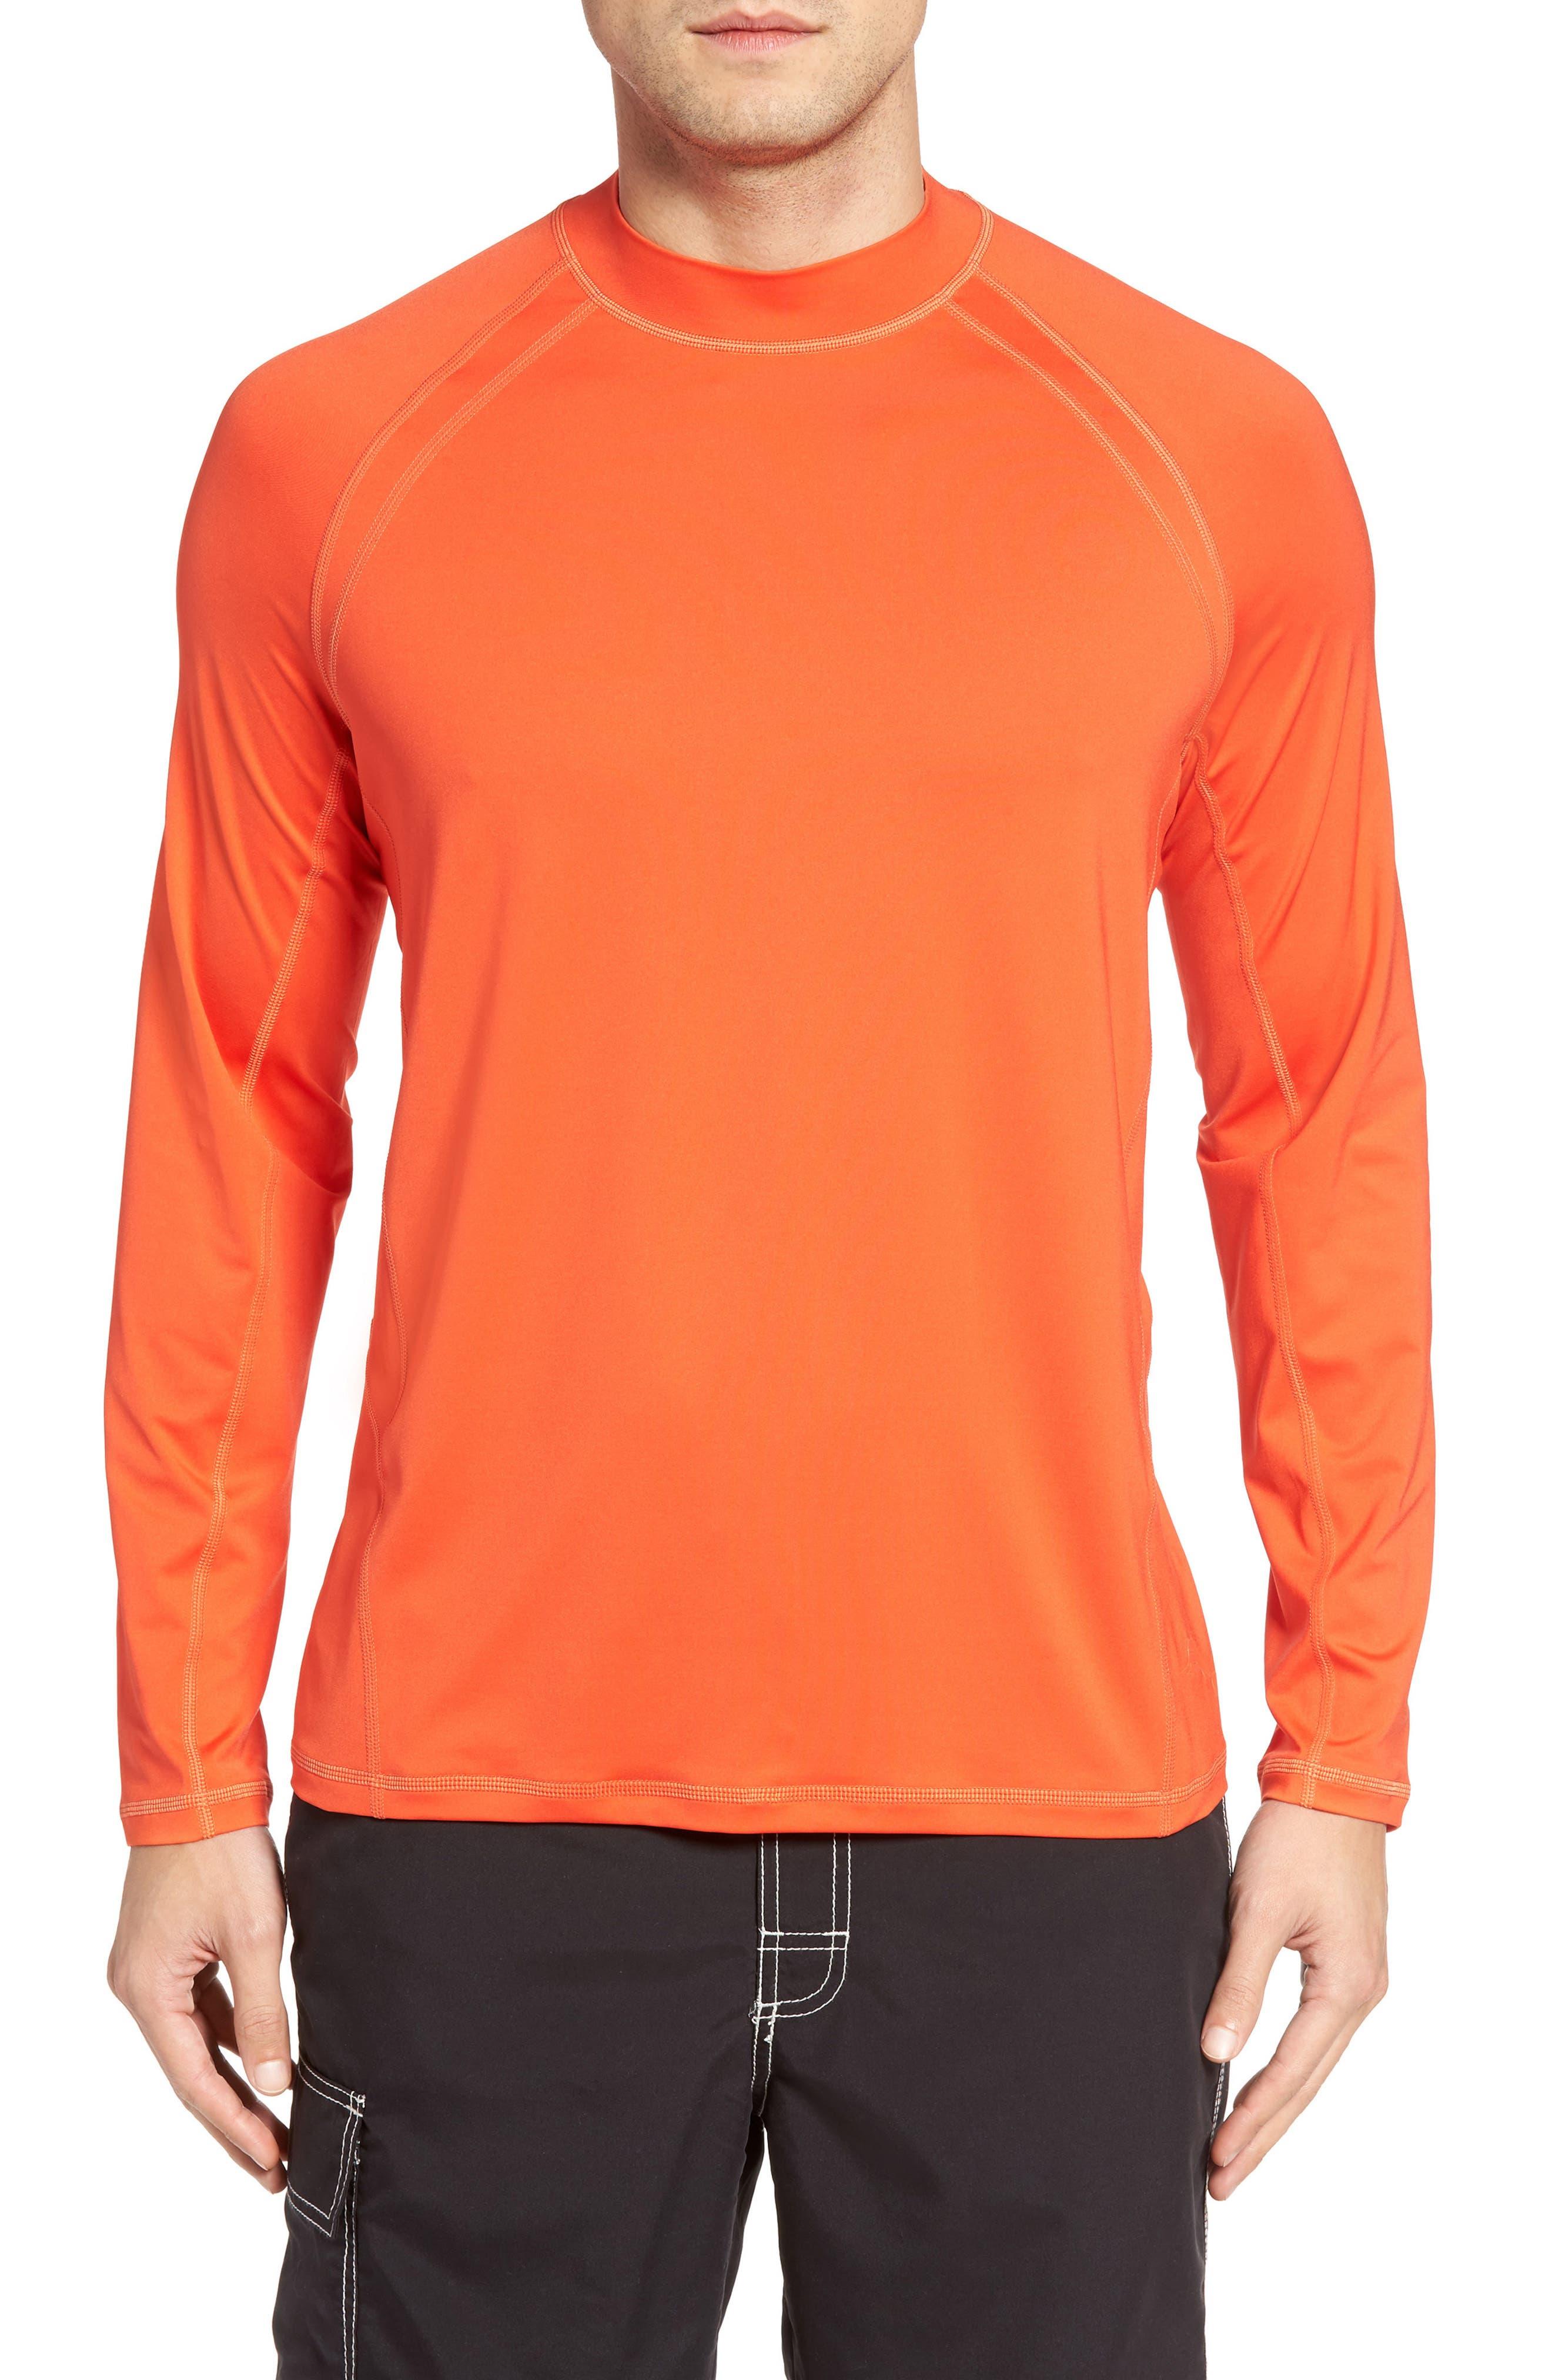 Main Image - Tommy Bahama Surf Chaser Crewneck T-Shirt